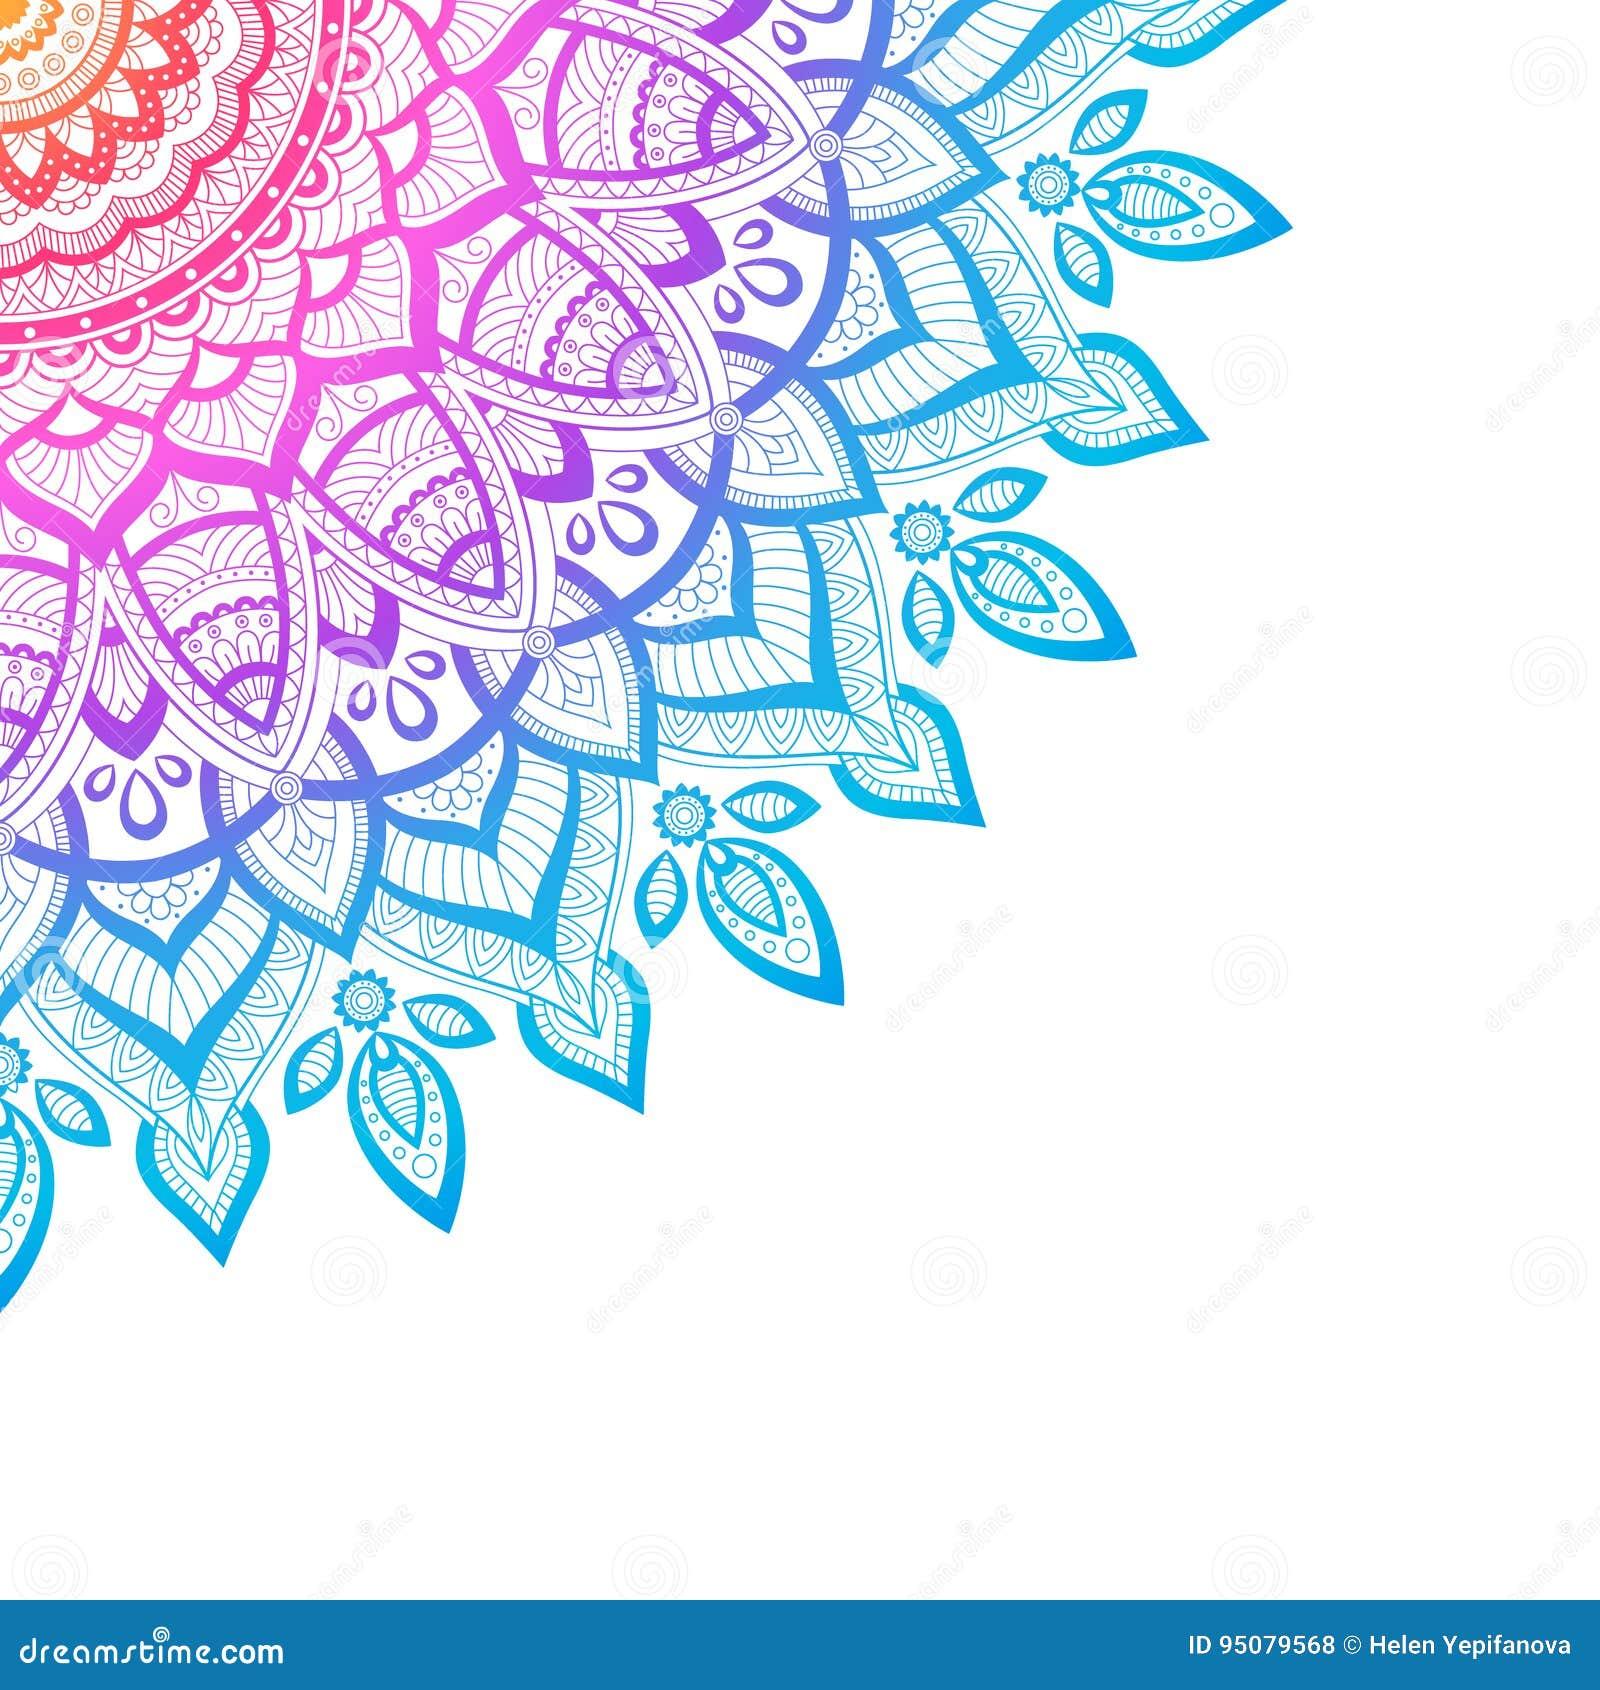 Zentangle background, wallpaper, texture, pattern. Round mandala, template for web design, postcards flyer poster advertising